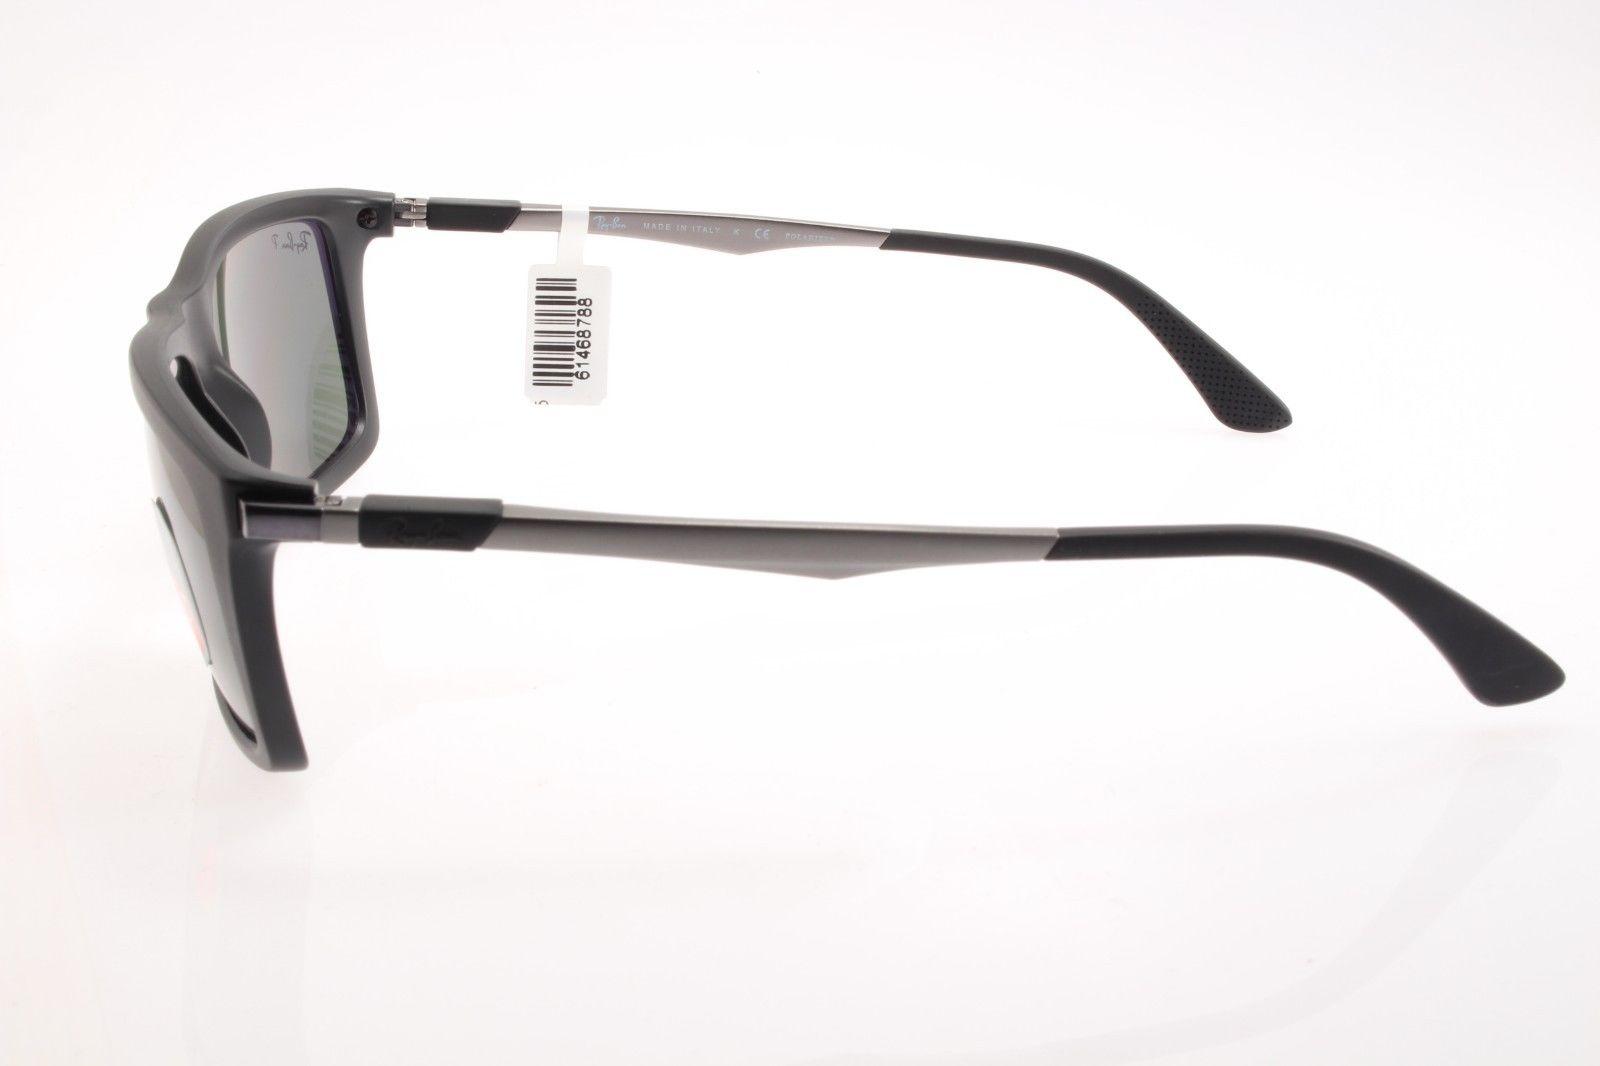 dd3dcffc6a New original sunglasses Ray Ban RB 4214 601-S 9A 59 Matte Black Polarized